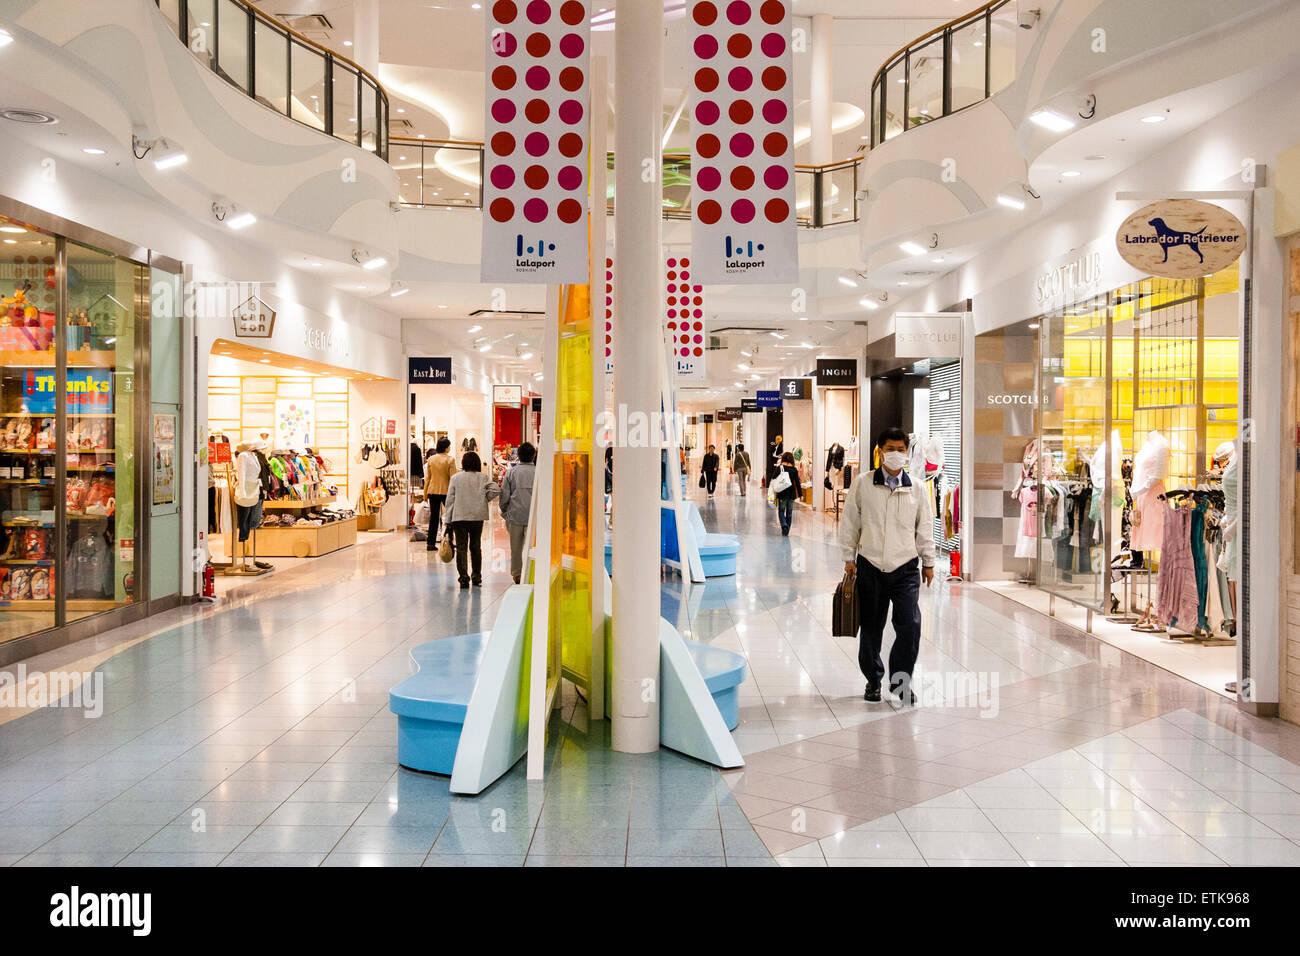 fbef58d8da Hell erleuchtet sehr sauber japanische moderne Shopping Center, Mall,  praktisch leer. Innenraum.